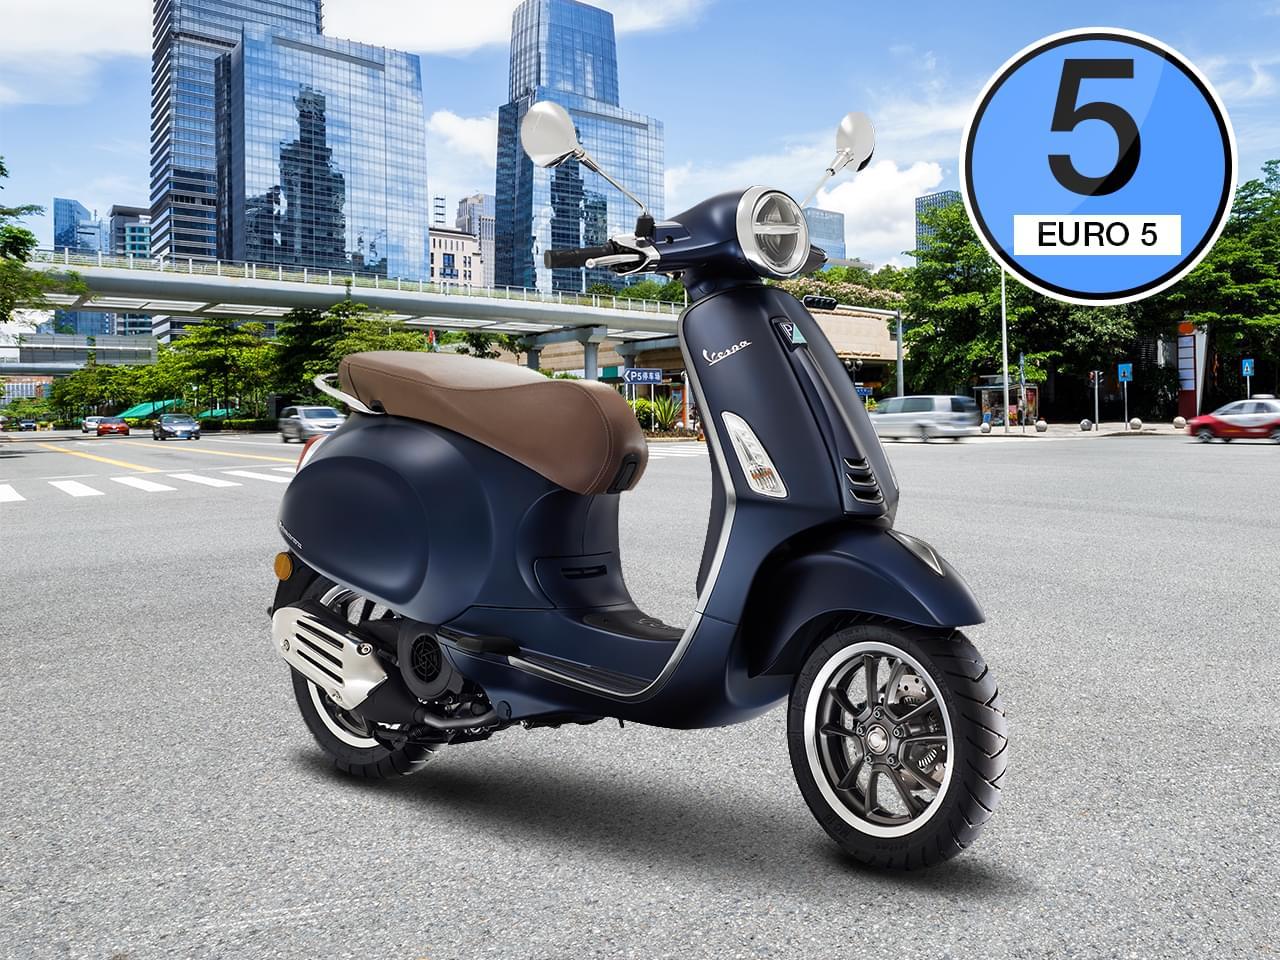 Vespa Primavera S 50 4T 3V i-get - Modell 2021